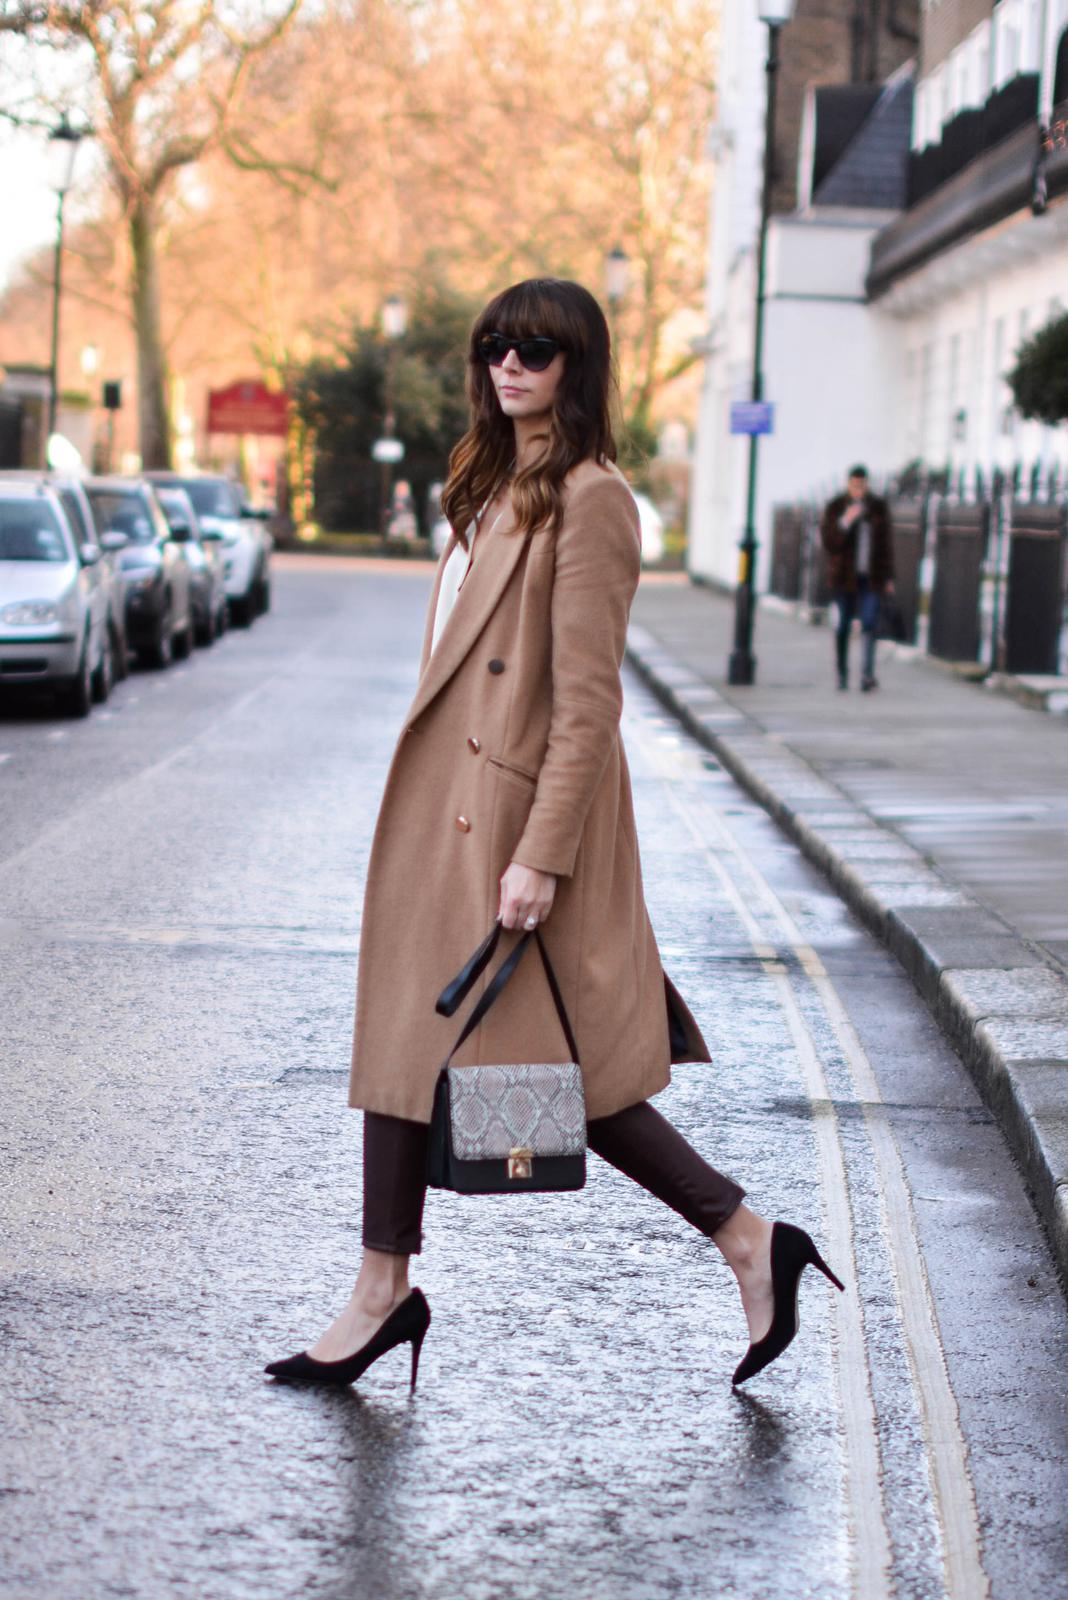 EJSTYLE - ASOS black court shoes, River Island camel coat, Zara burgundy biker trousers faux leather, Snakeskin shoulder bag, OOTD, fashion blogger, chic outfit, Emma Hill